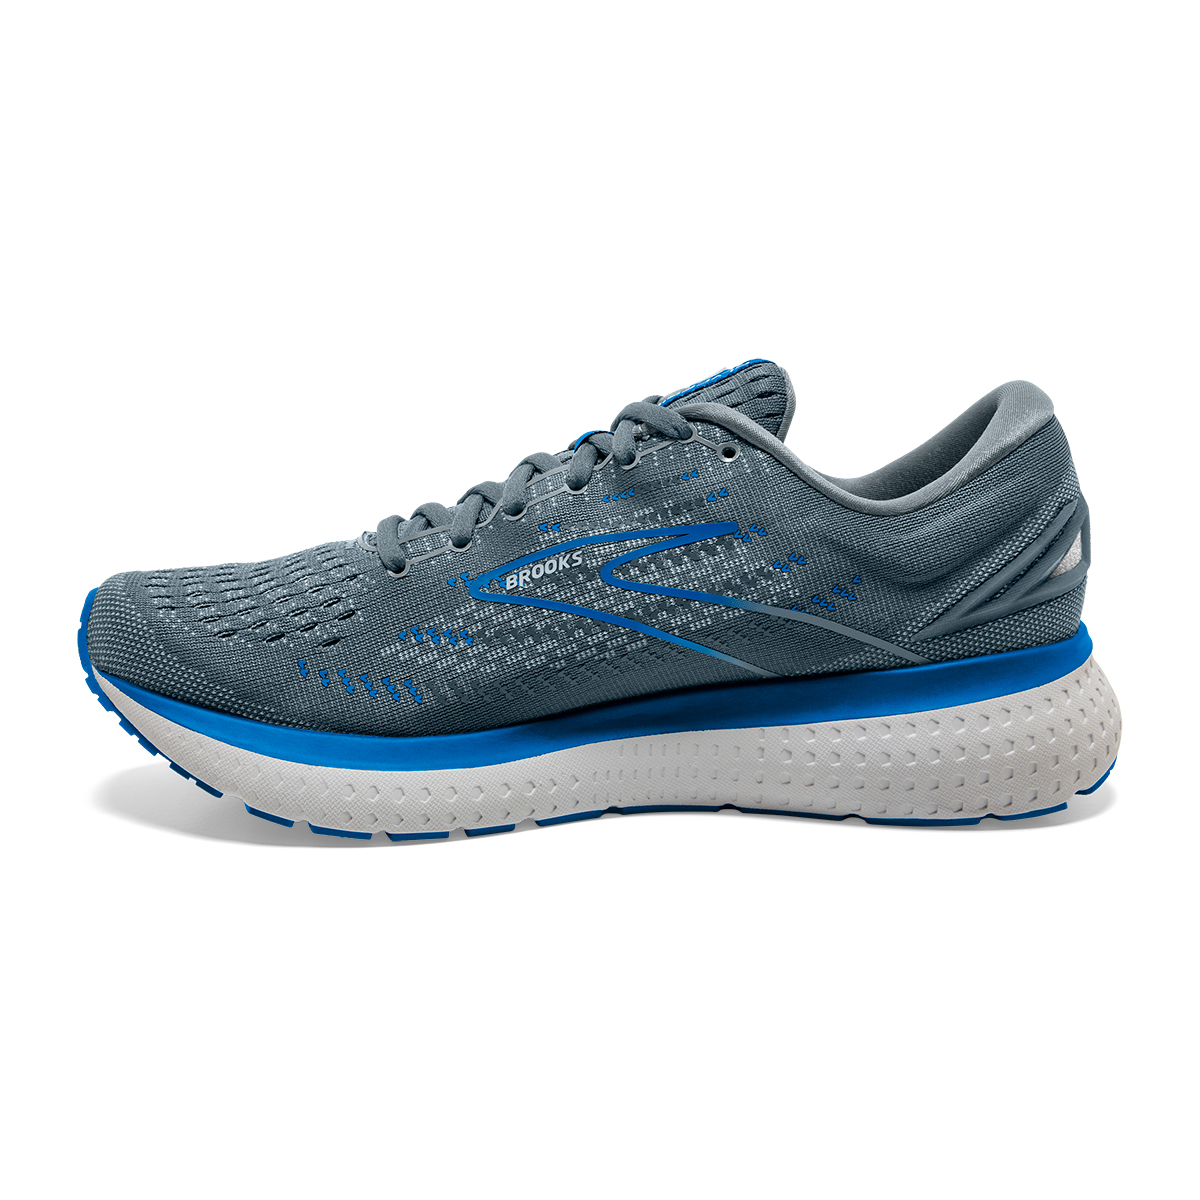 Men's Brooks Glycerin 19 Running Shoe - Color: Quarry/Grey/Dark - Size: 7 - Width: Regular, Quarry/Grey/Dark, large, image 5